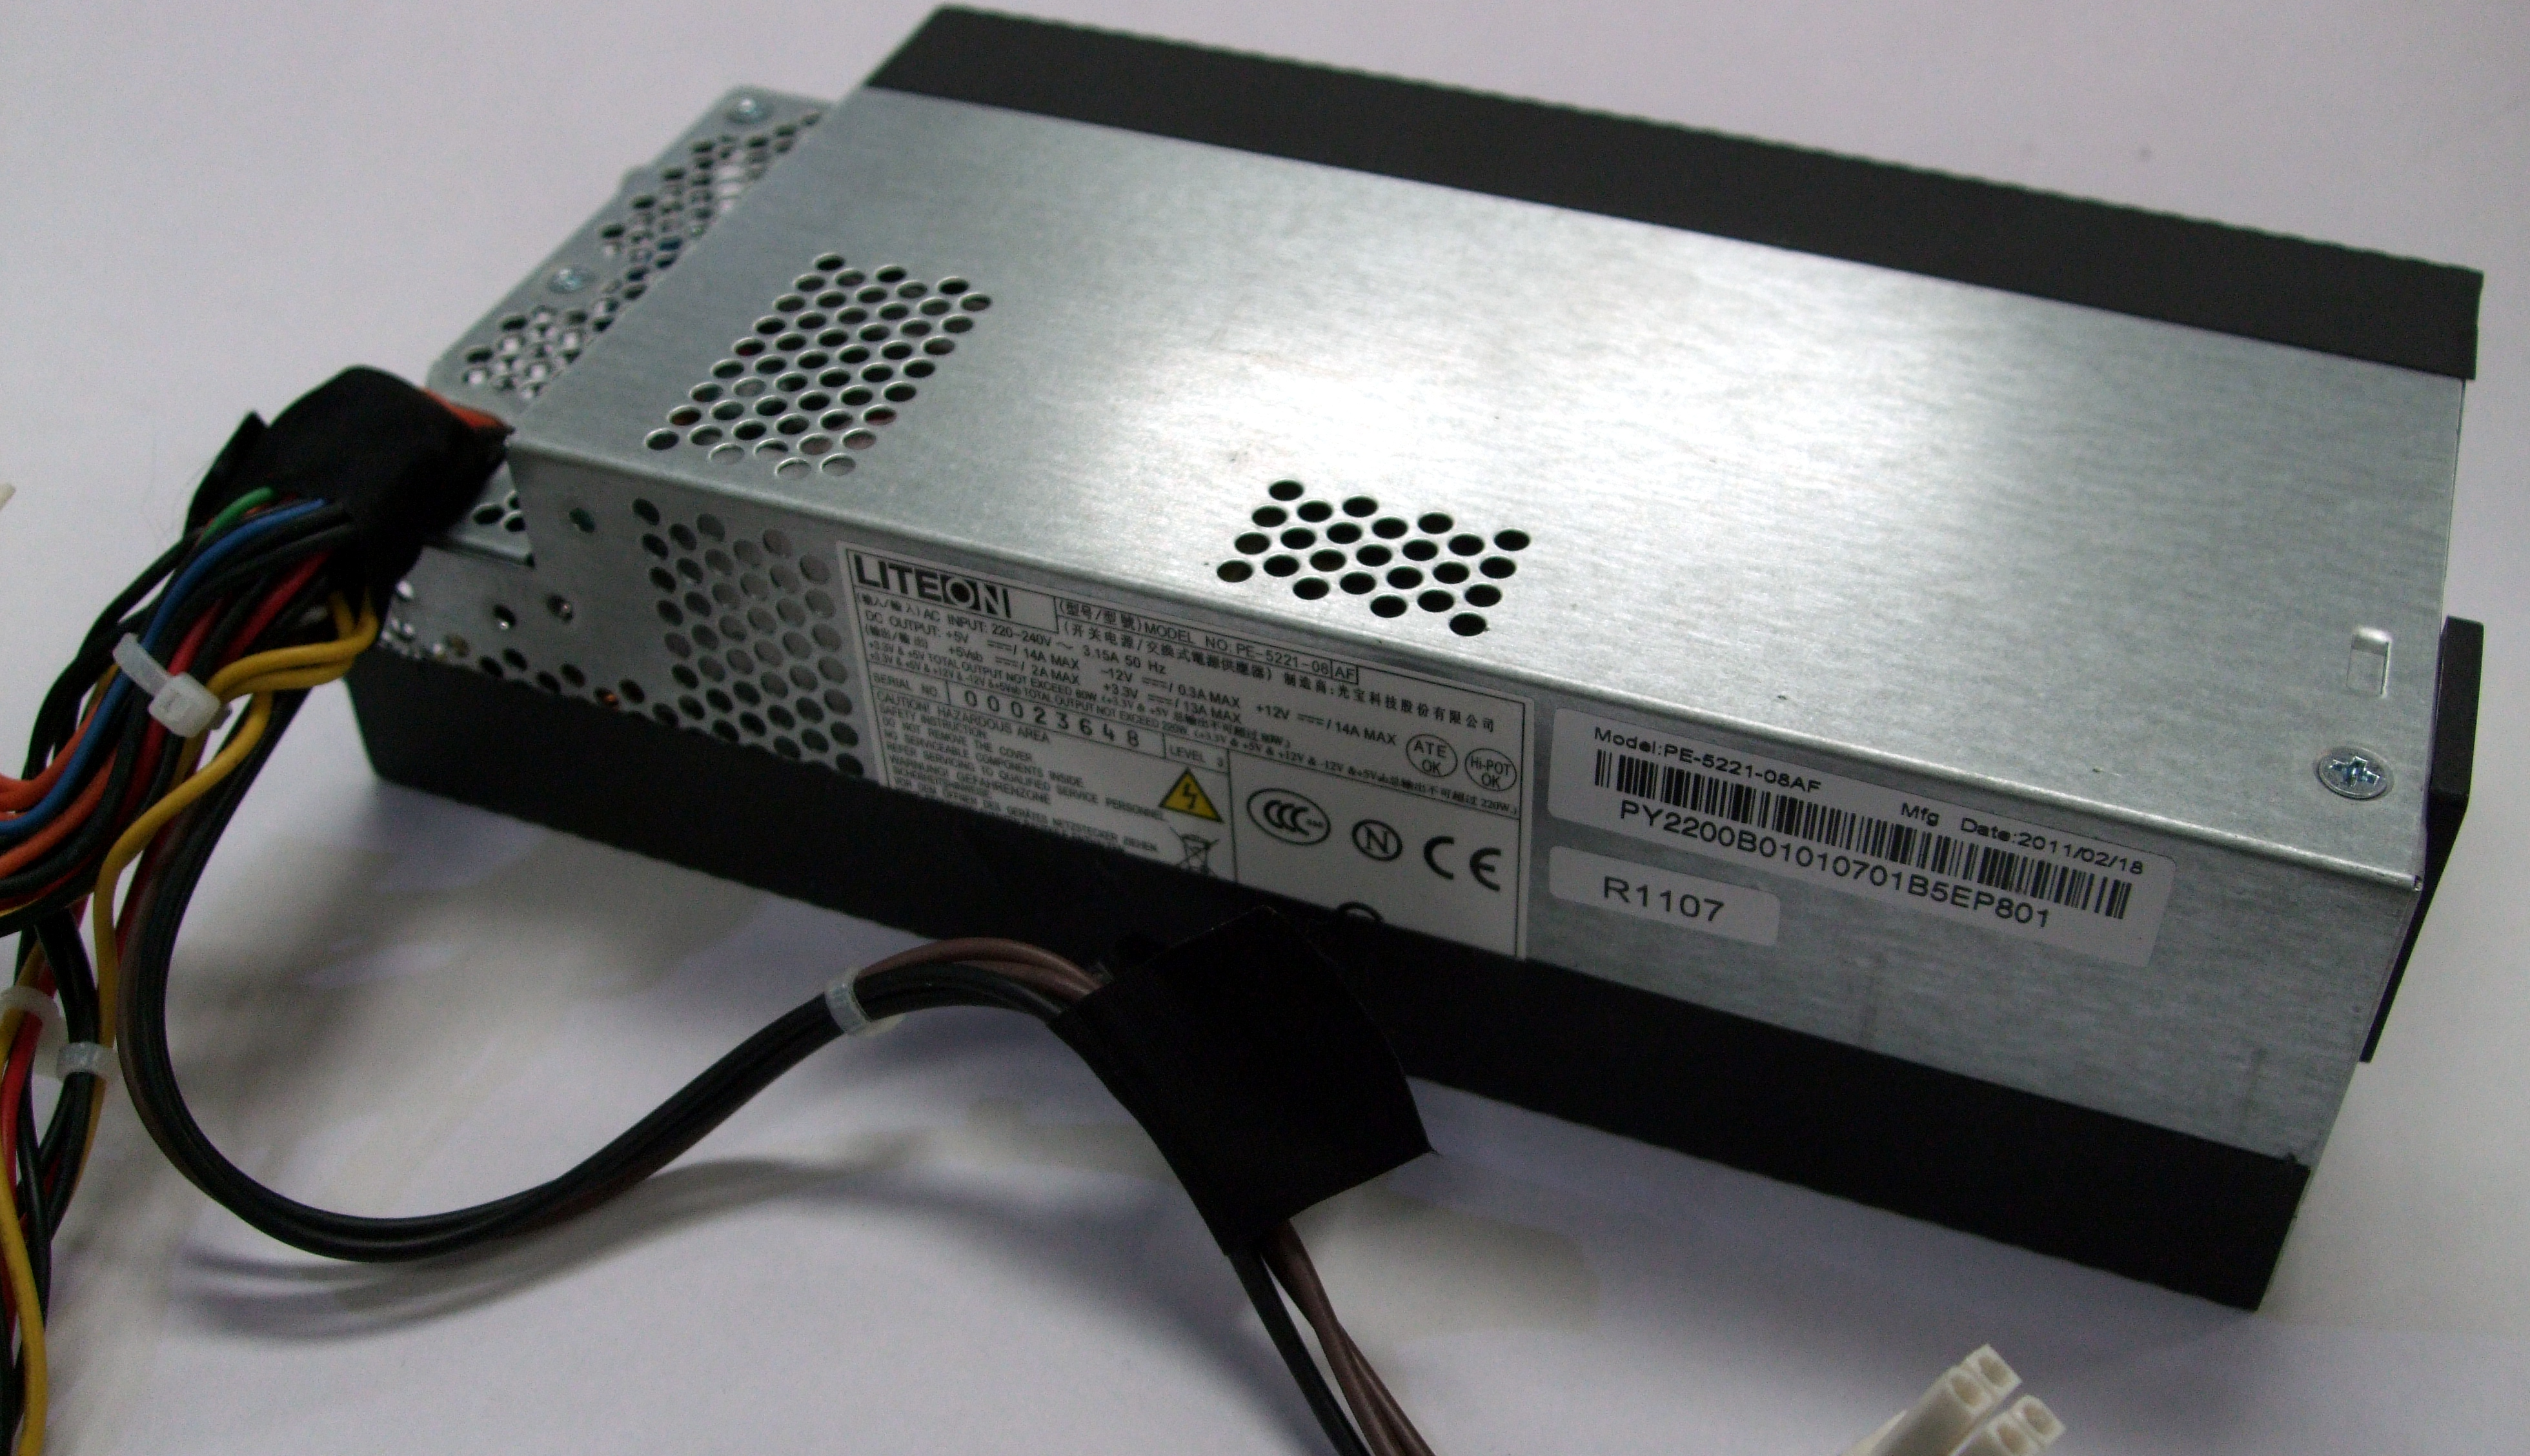 Liteon PE-5221-08 AF 20/24-Pin 220W Power Supply PY.2200B.010